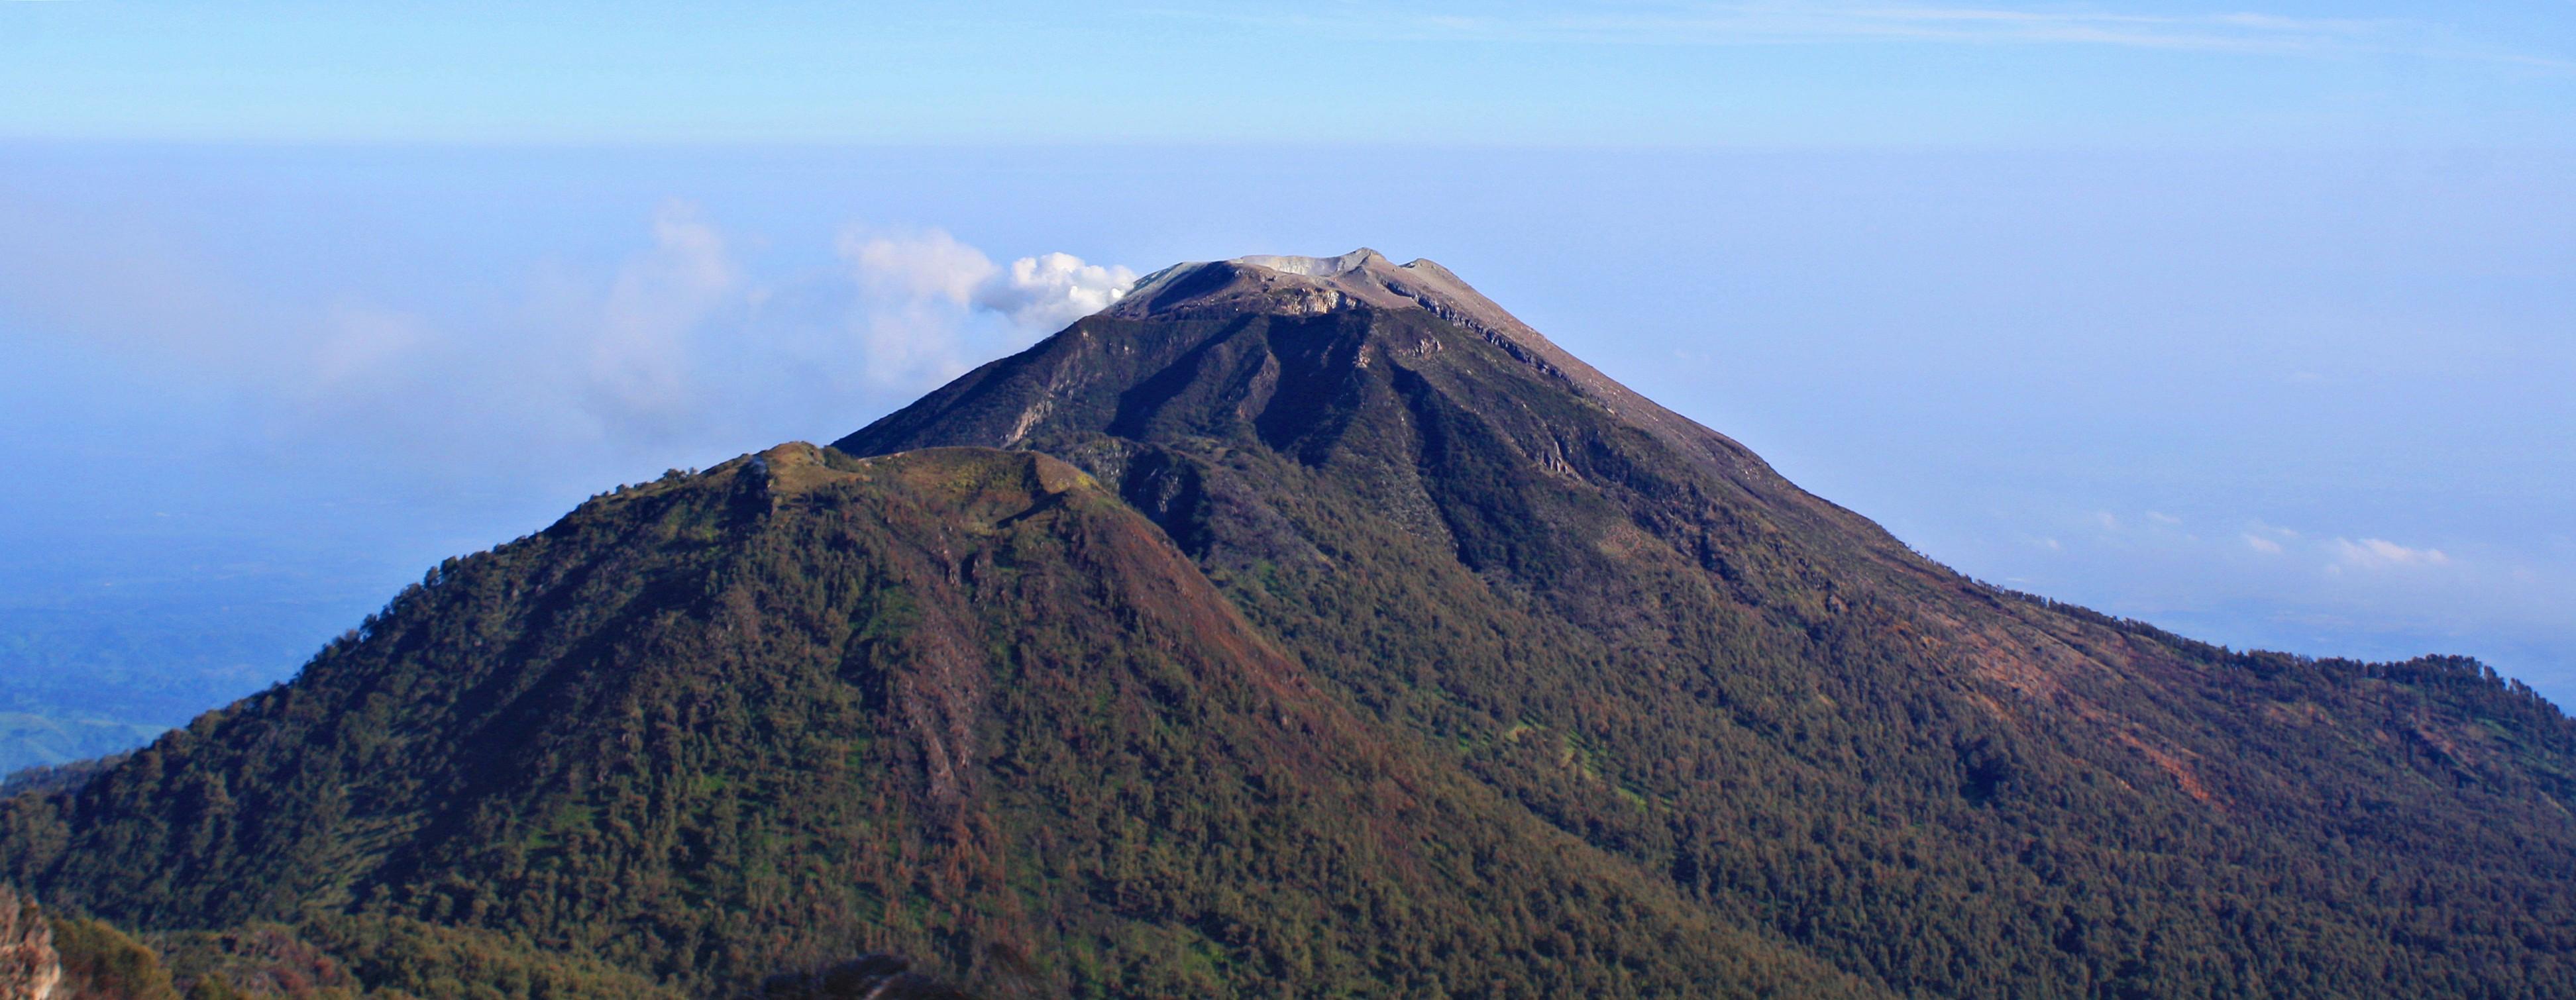 gunung welirang